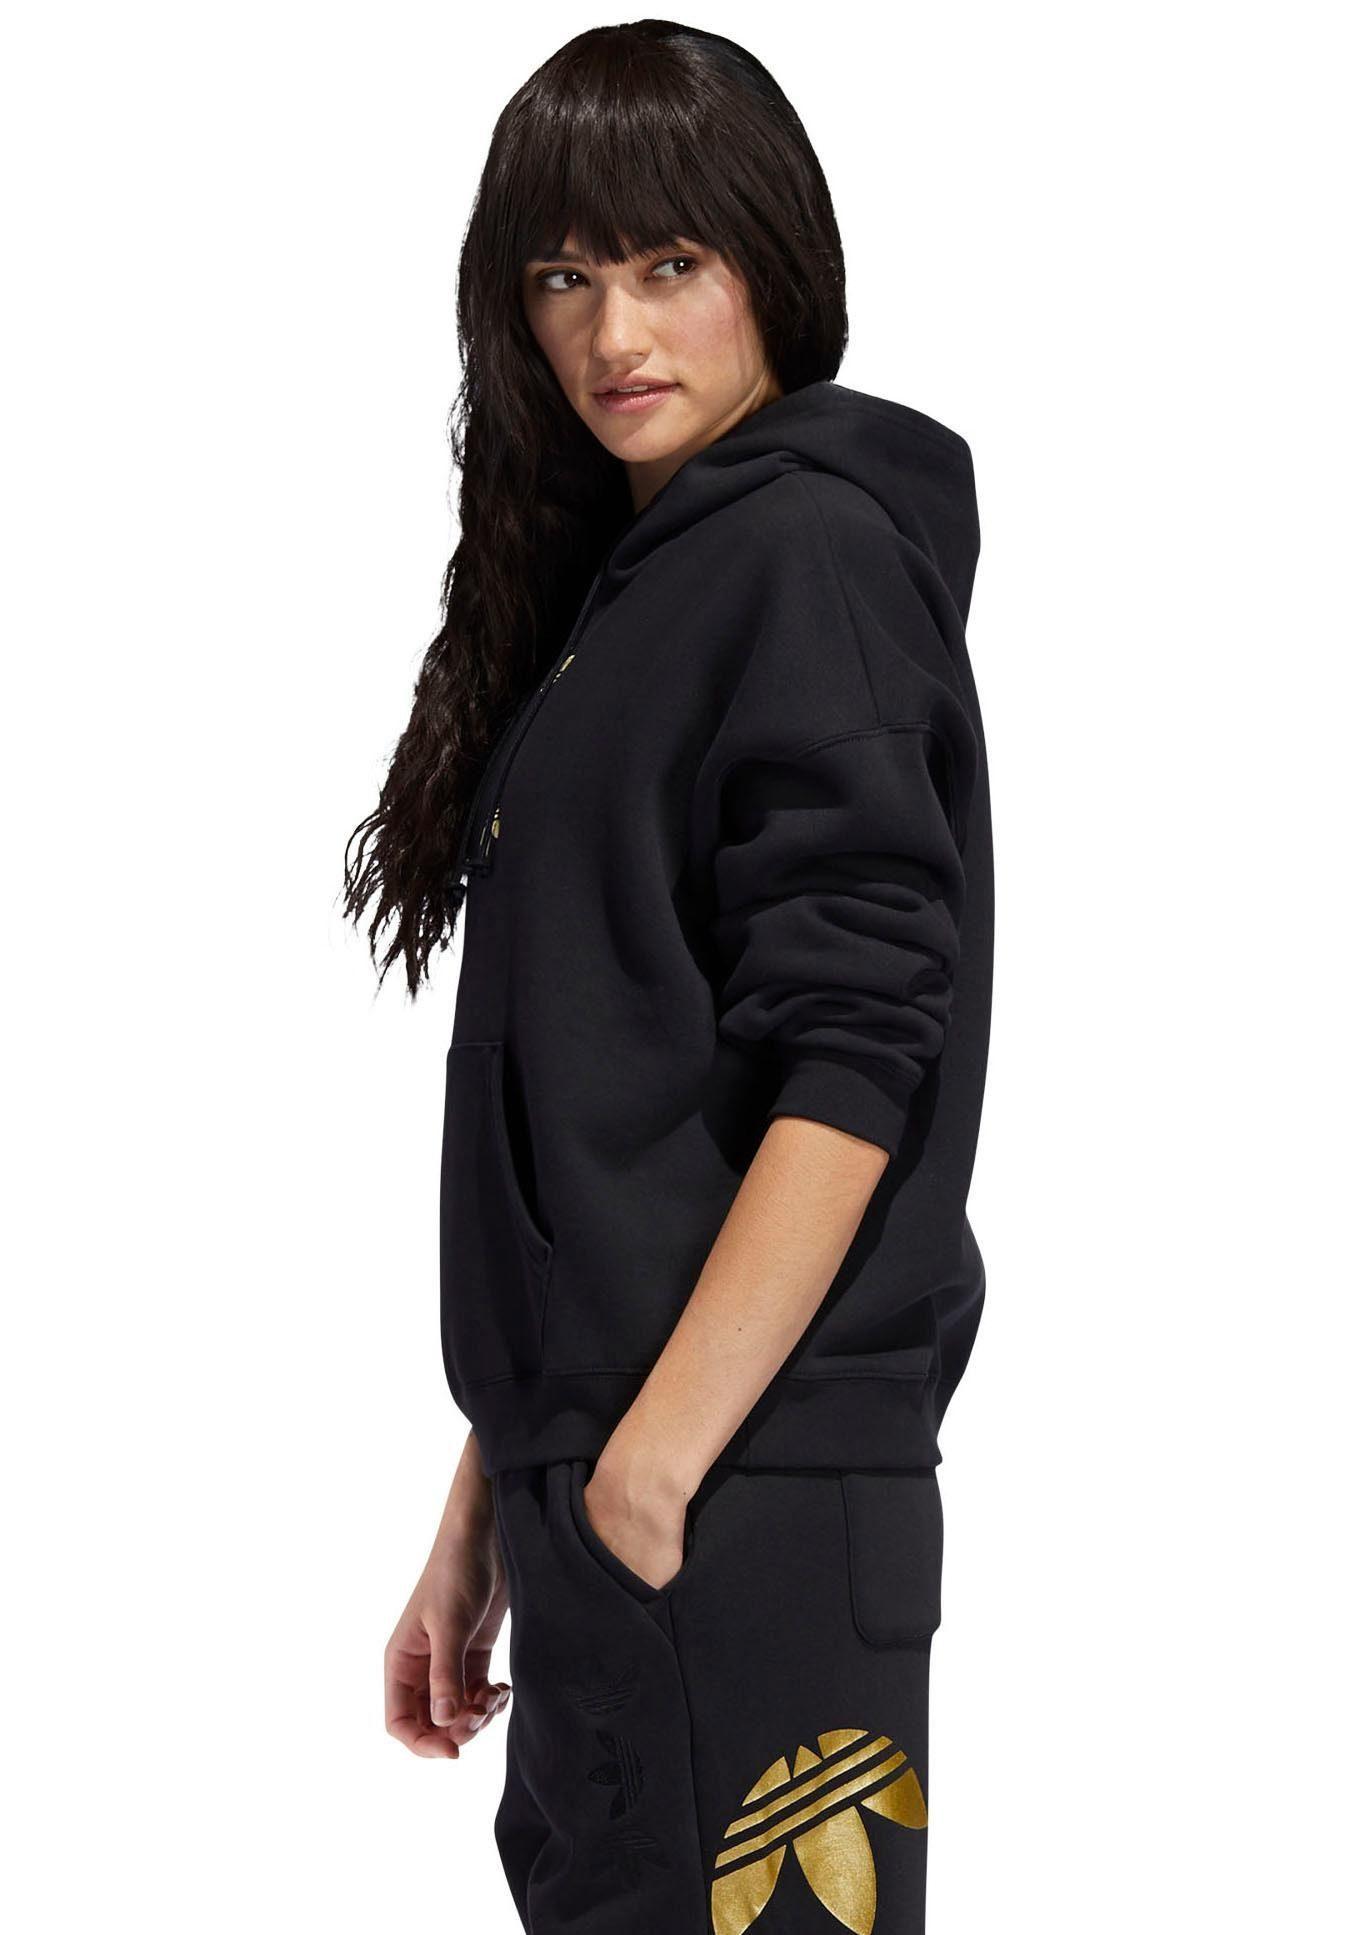 adidas Originals Kapuzensweatshirt, Logodrucke online kaufen tkVsY1